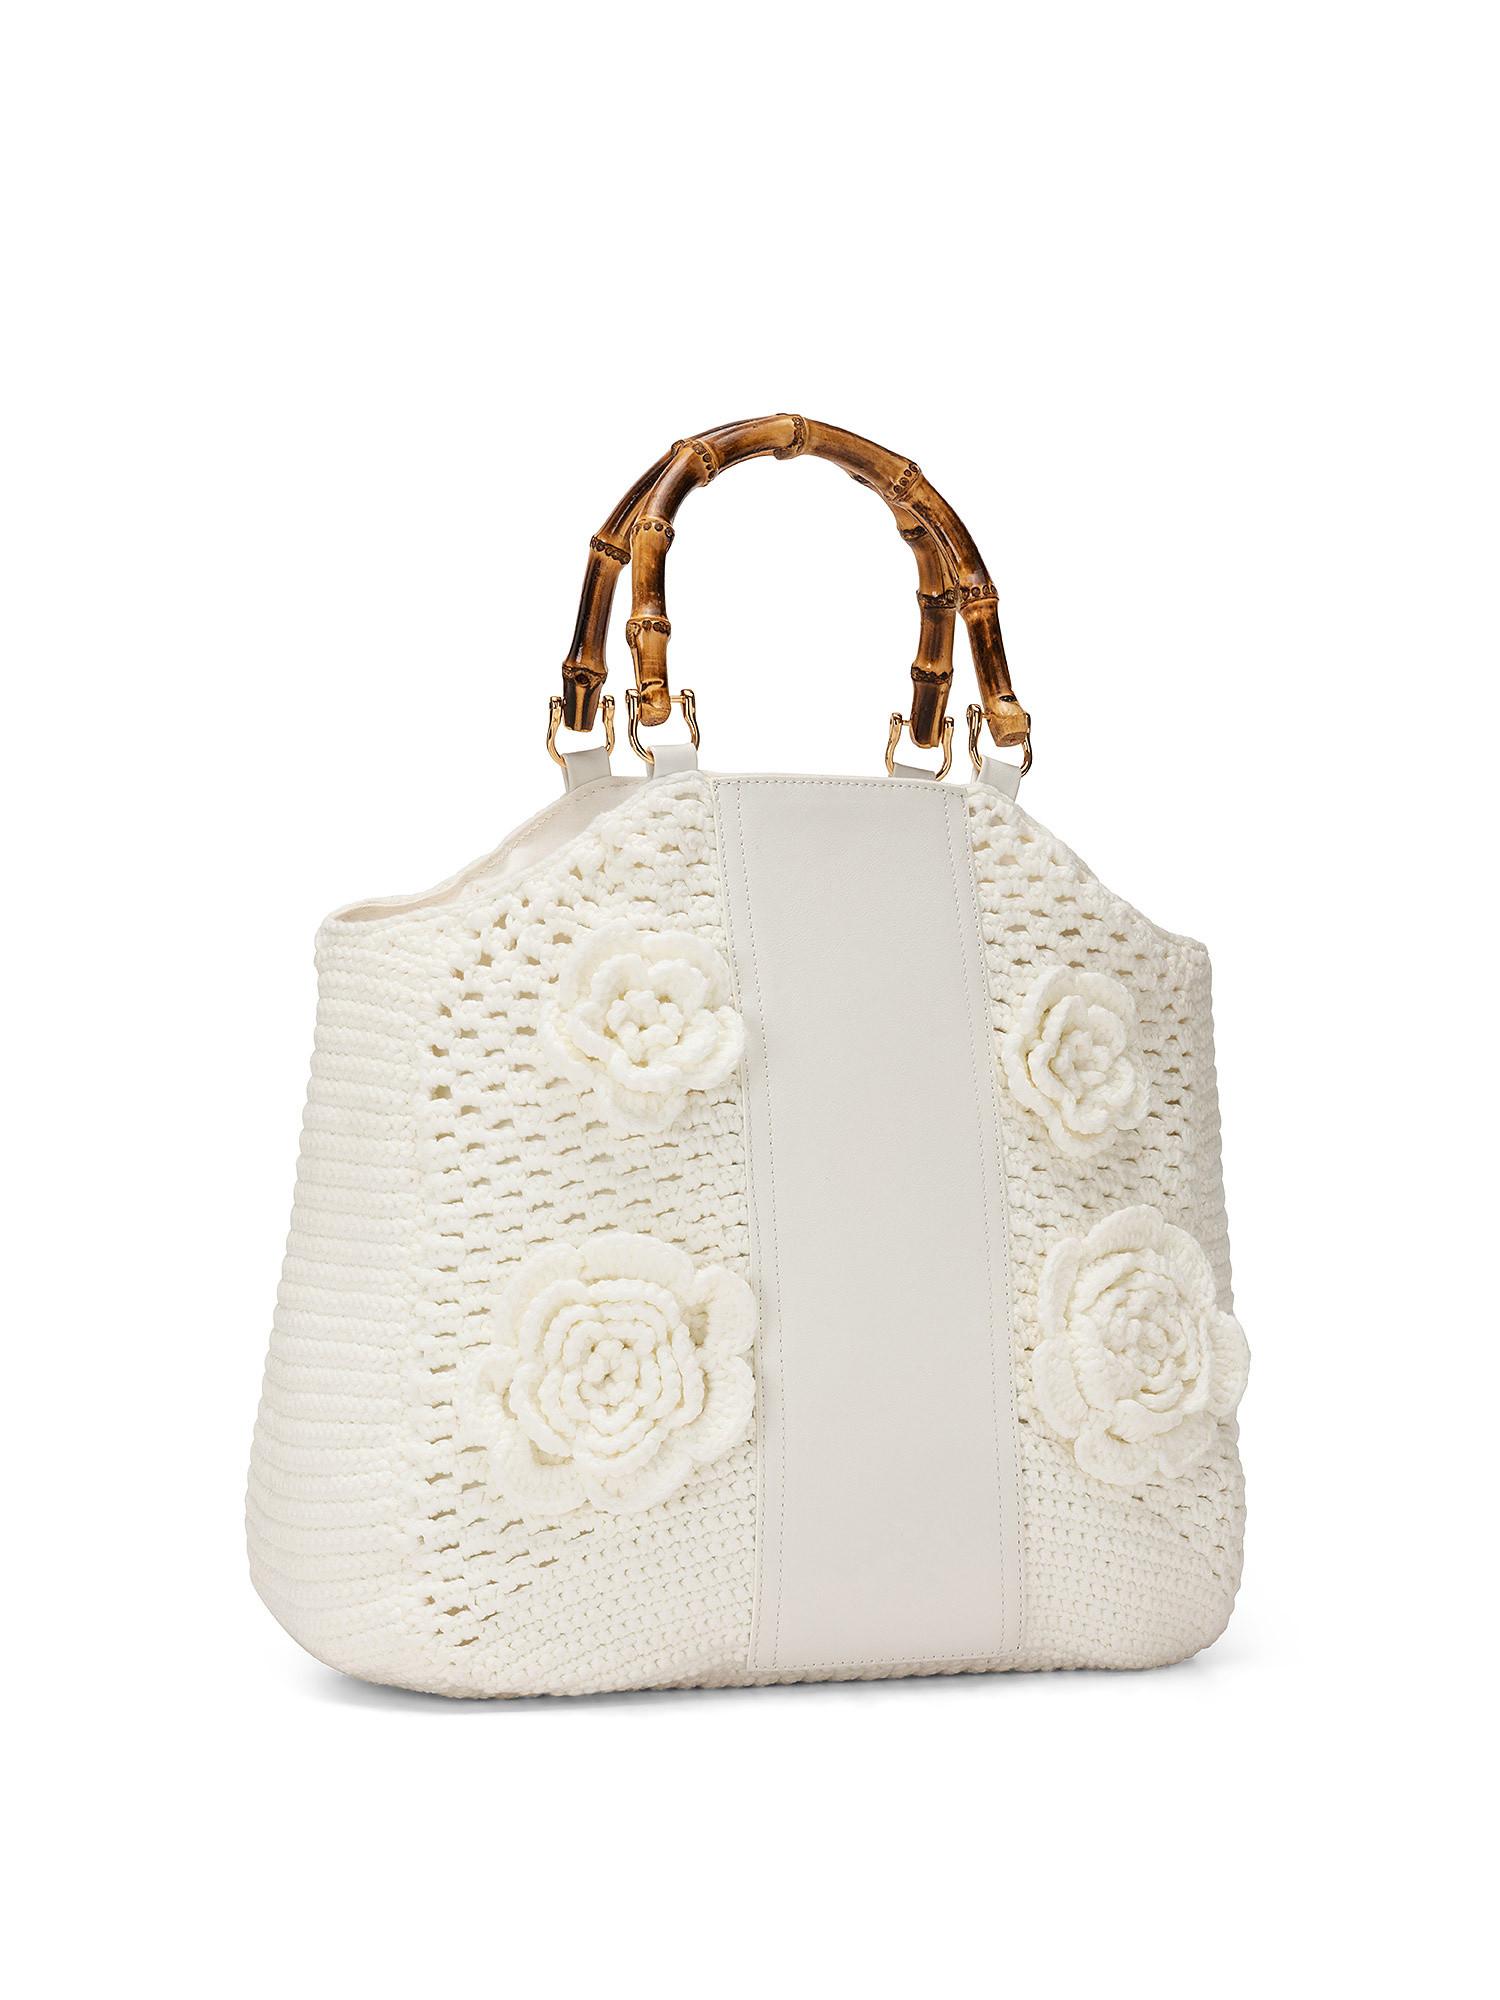 Shopper Crochet con applicazioni, Bianco, large image number 1